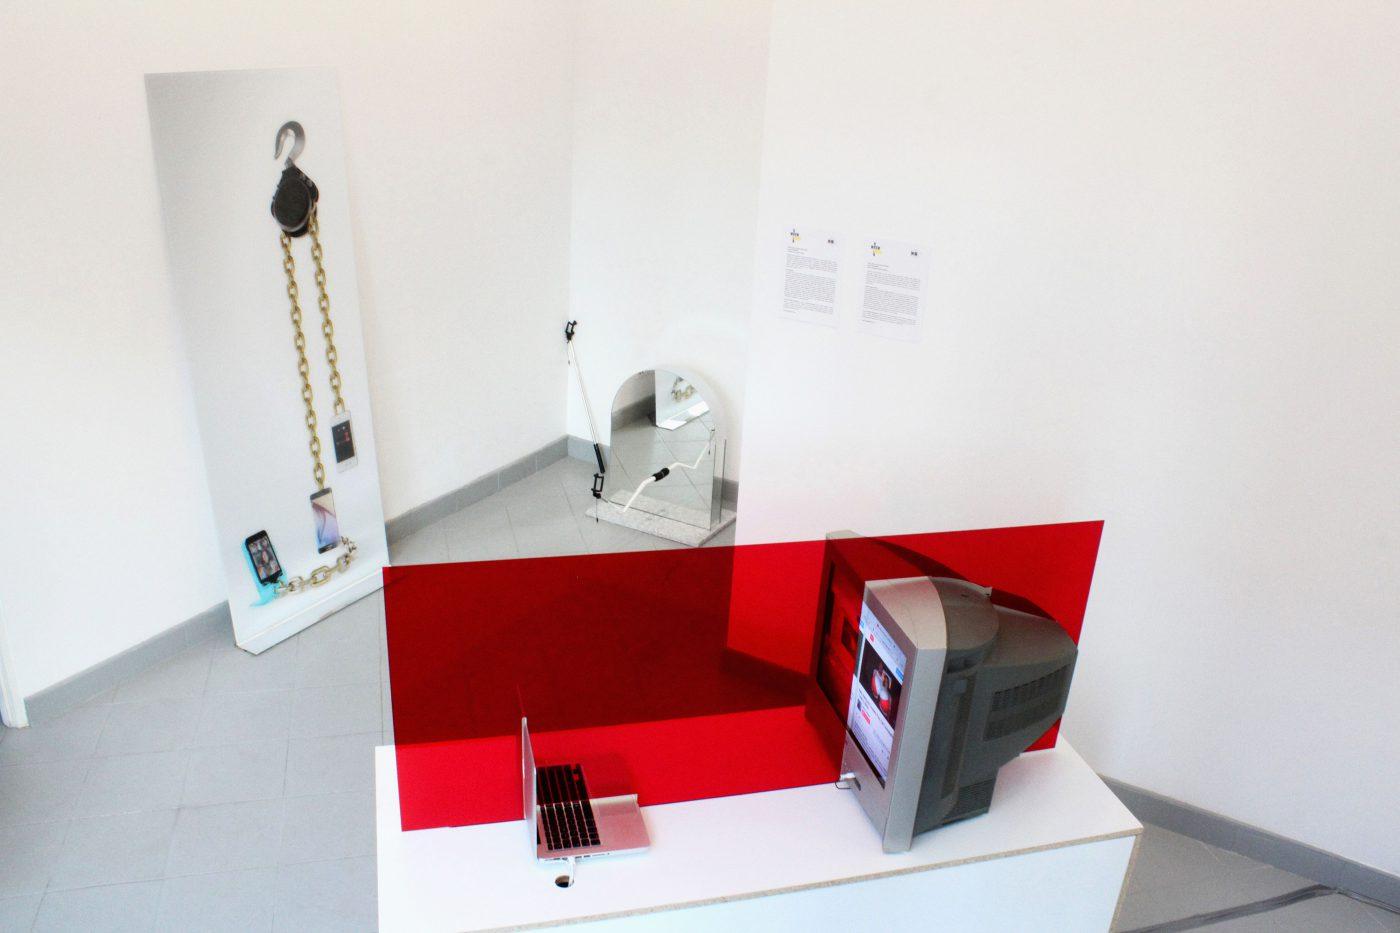 Installation by Lucas Gutierrez